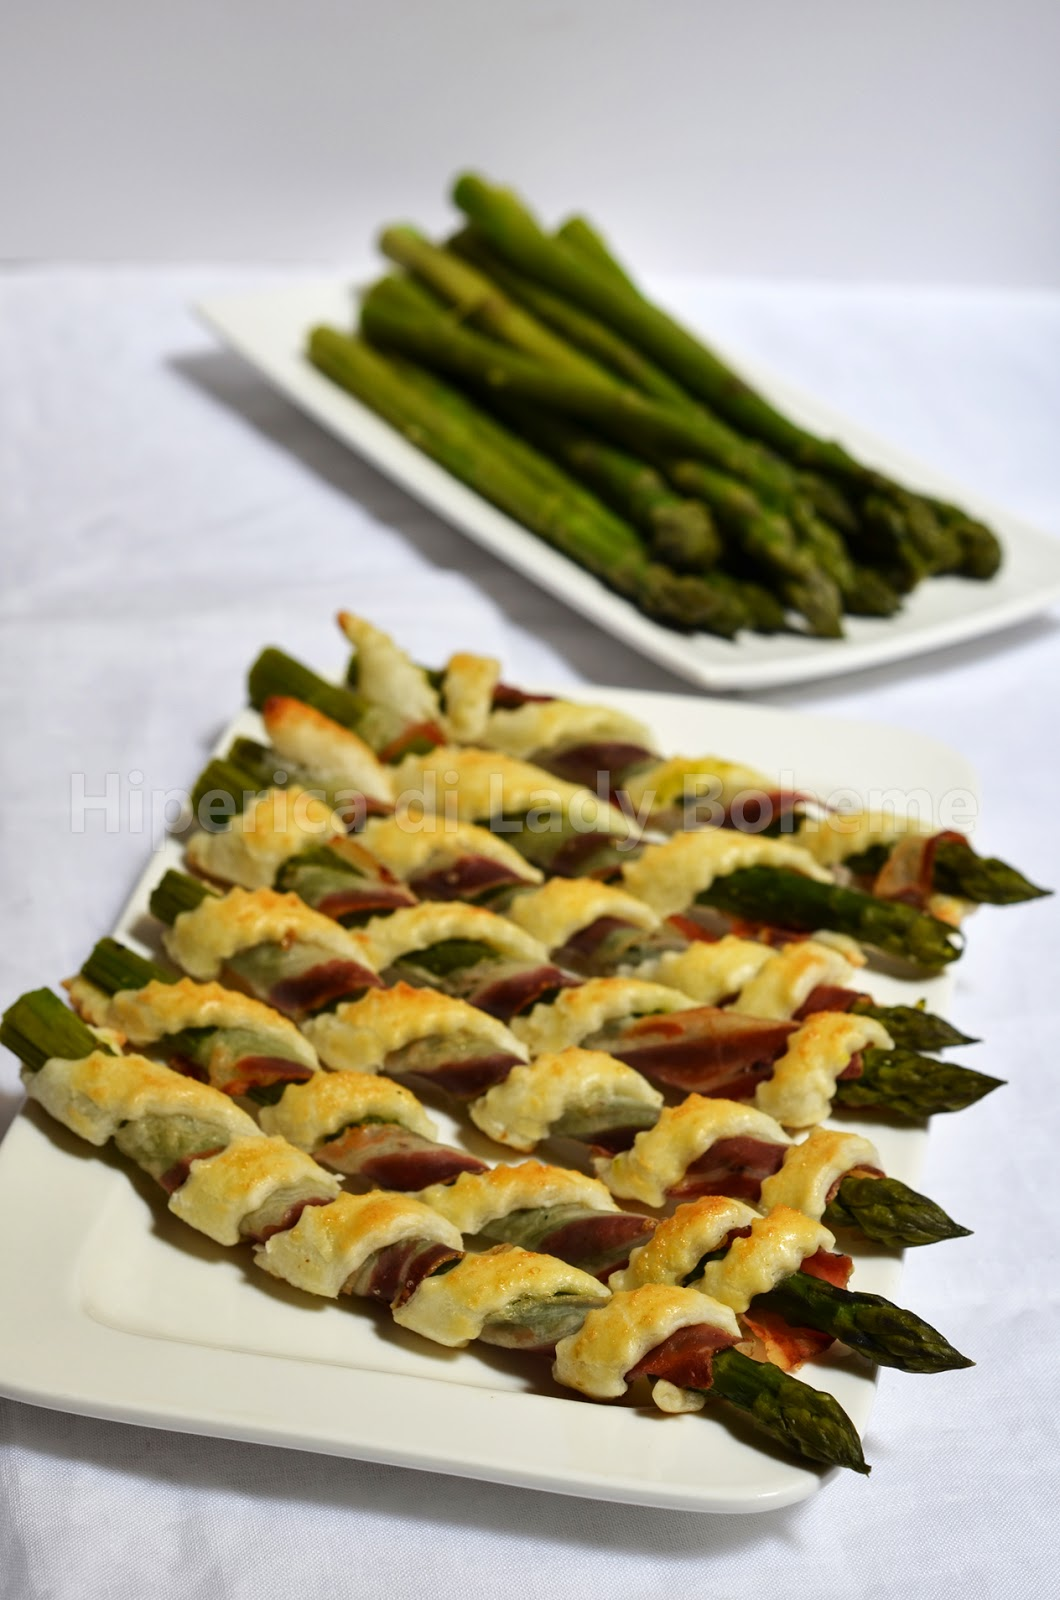 hiperica_lady_boheme_blog_cucina_ricette_gustose_facili_veloci_cannoli_di_pasta_sfoglia_con_asparagi_e_pancetta_2